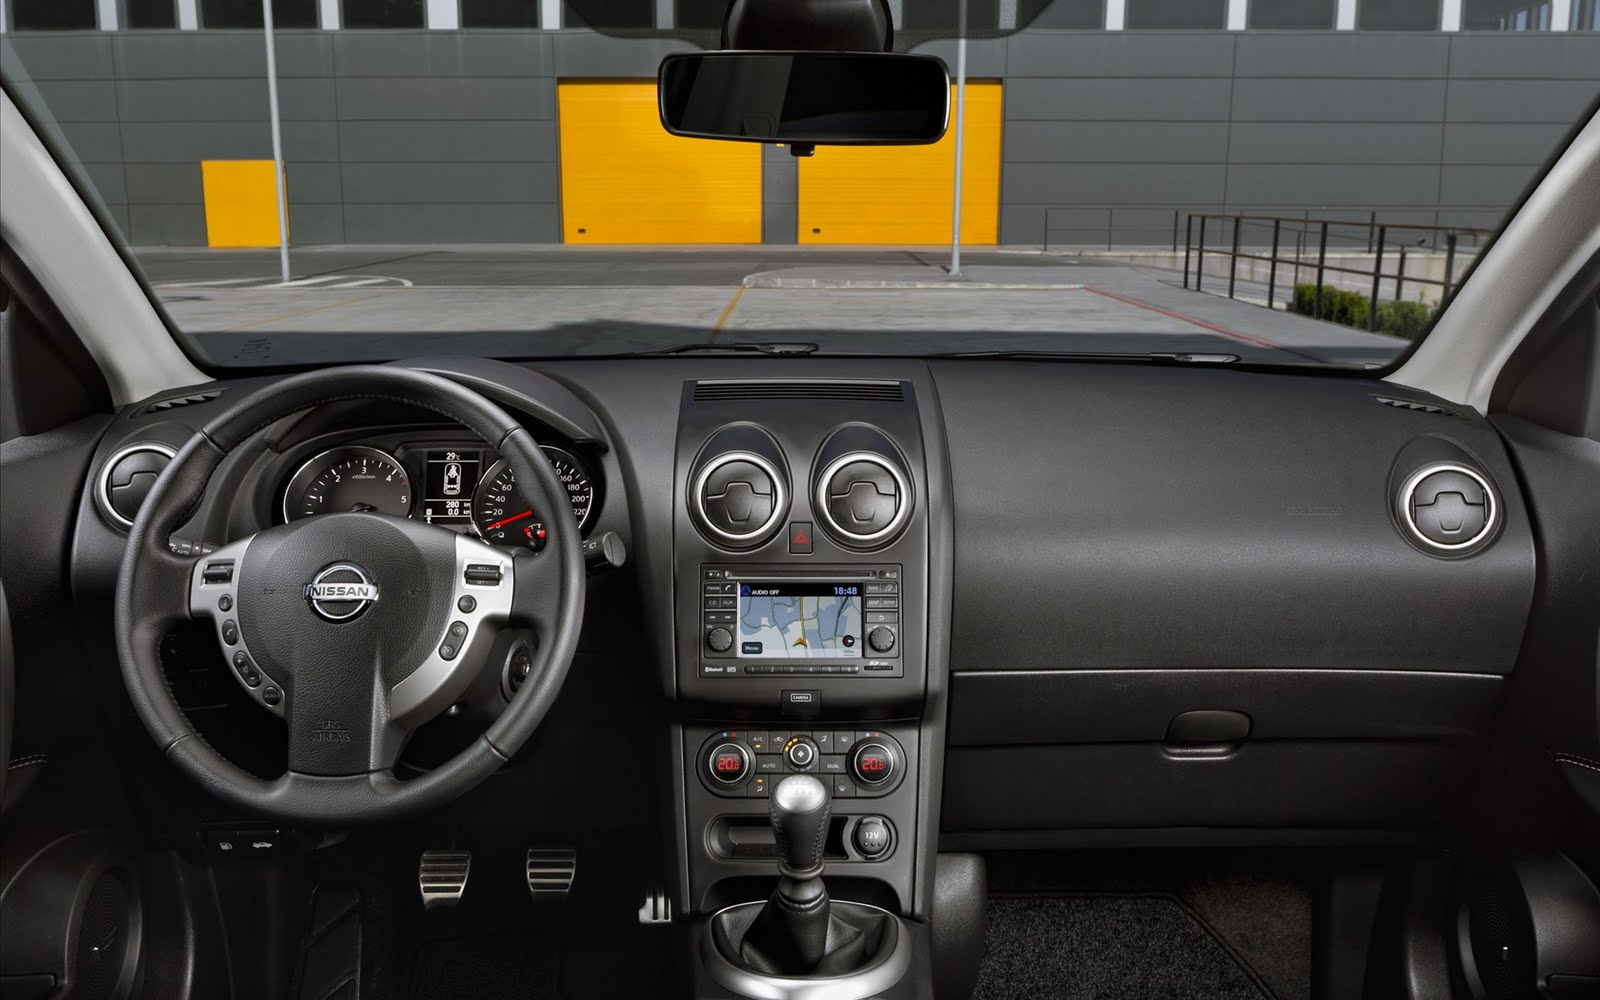 http://3.bp.blogspot.com/-tmF451m1uio/TmnIHe7CyRI/AAAAAAAAUjs/heNMAR2kPsQ/s1600/nissan-qashqai-2012-car-wallpapers-widescreen-03.jpg